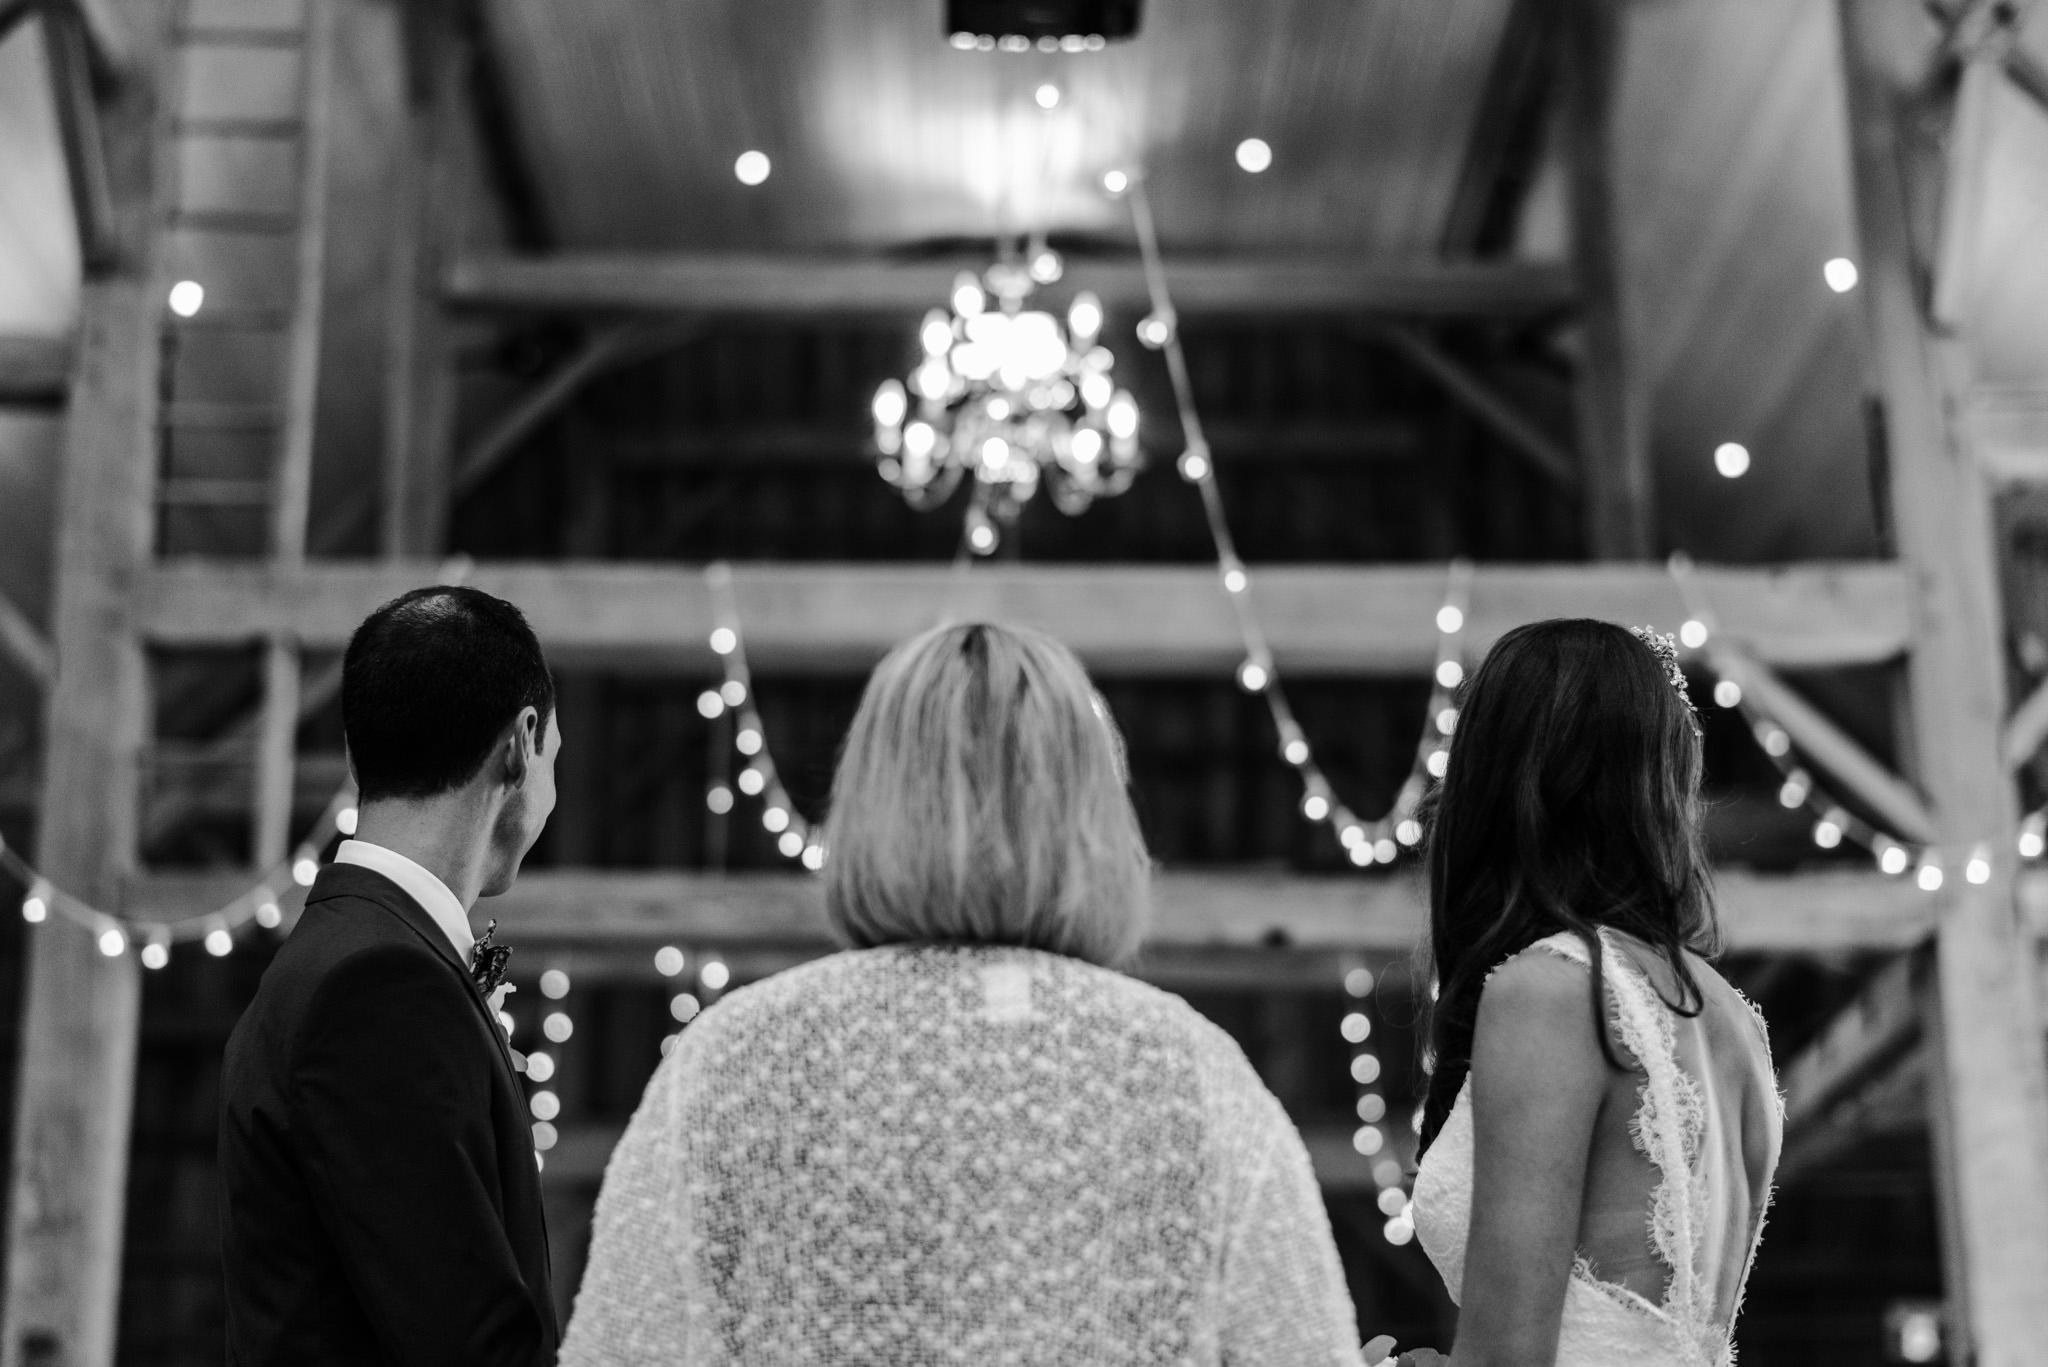 126-wedding-ceremony-in-the-rain-toronto-photographer.jpg